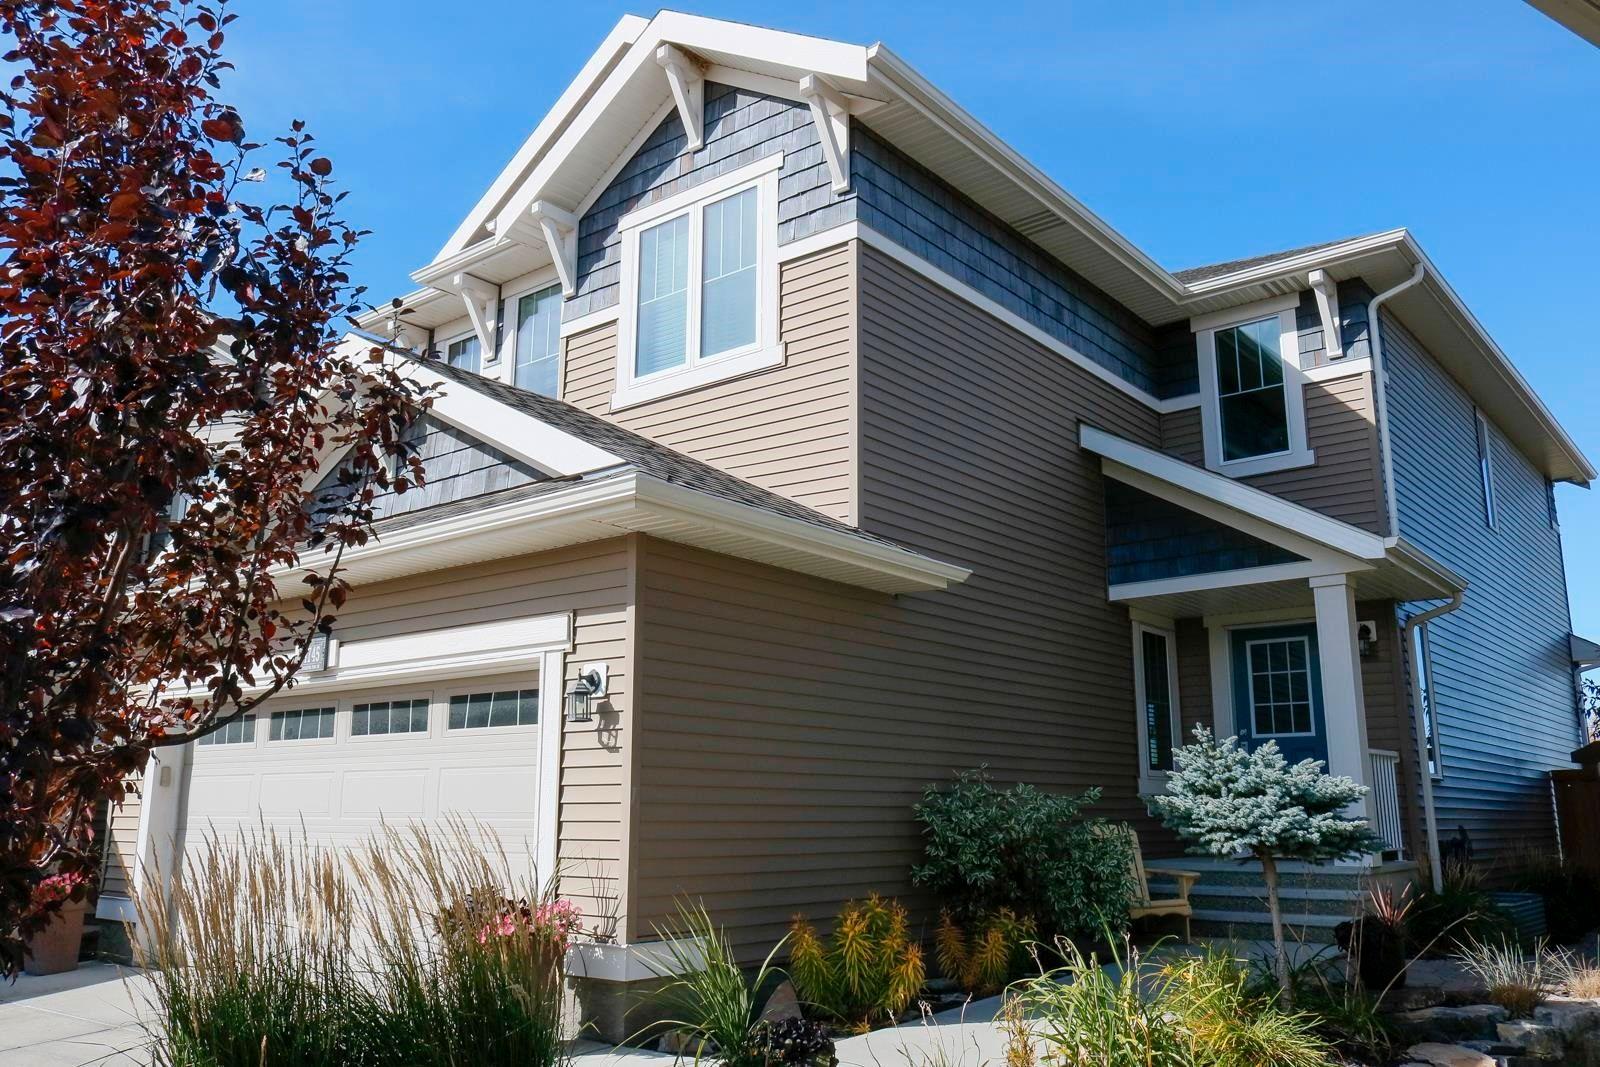 Main Photo: 4745 CRABAPPLE Run in Edmonton: Zone 53 House for sale : MLS®# E4264095